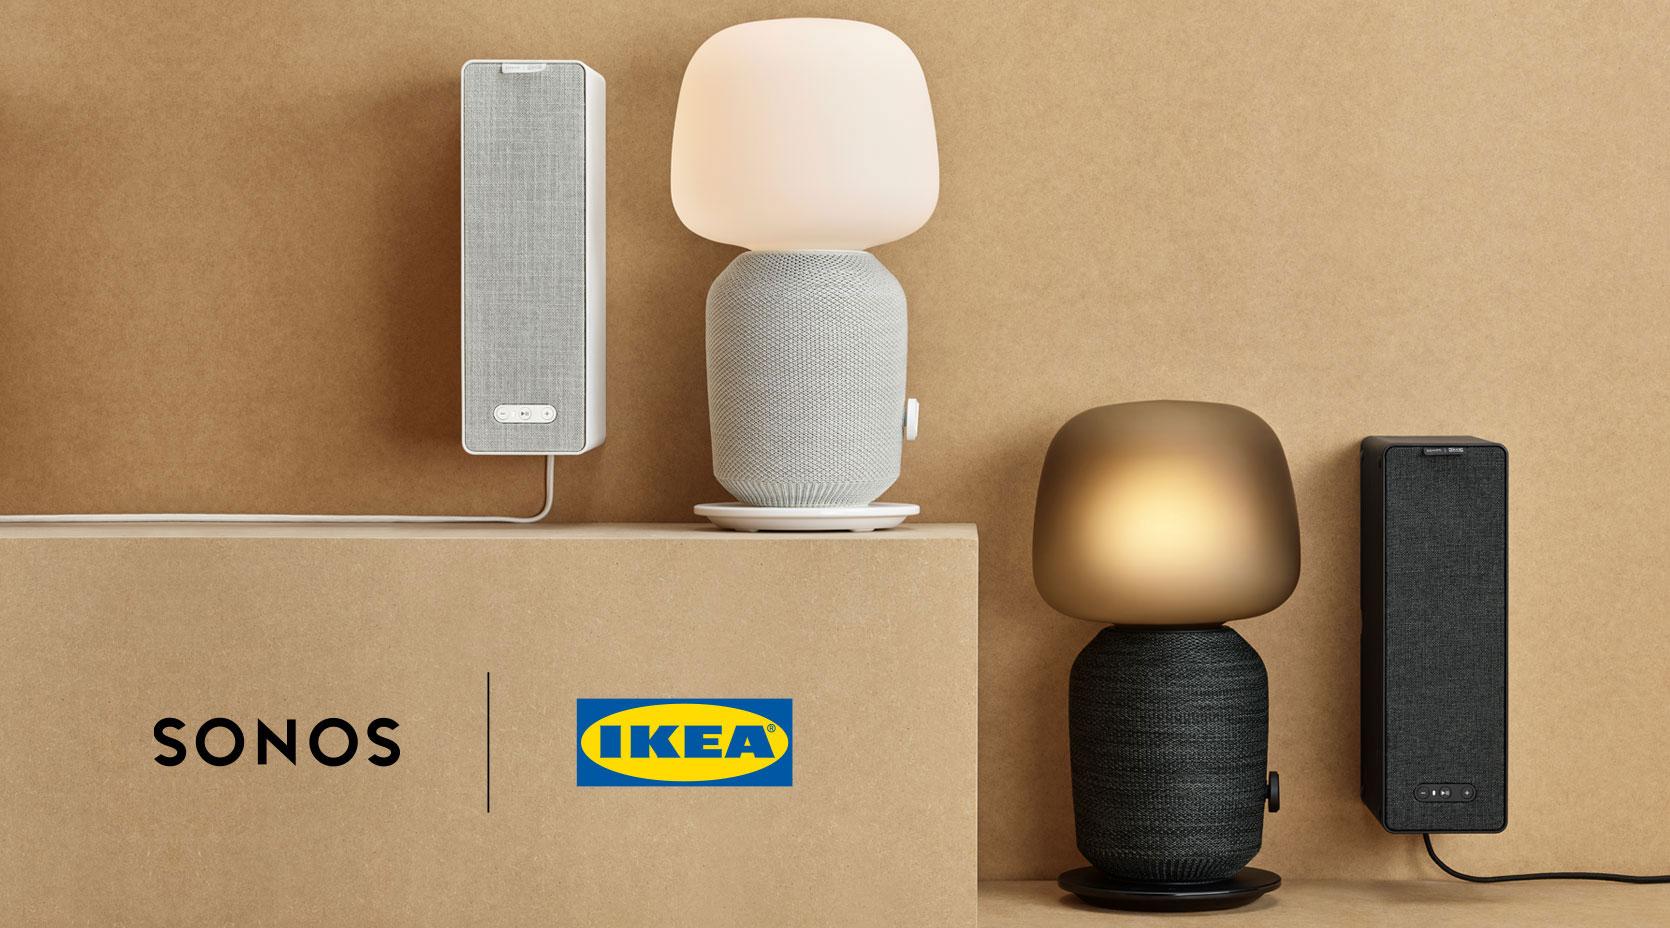 IKEA SYMFONISK: Neue Sonos-Lautsprecher im August ab 18 Euro › ifun.de